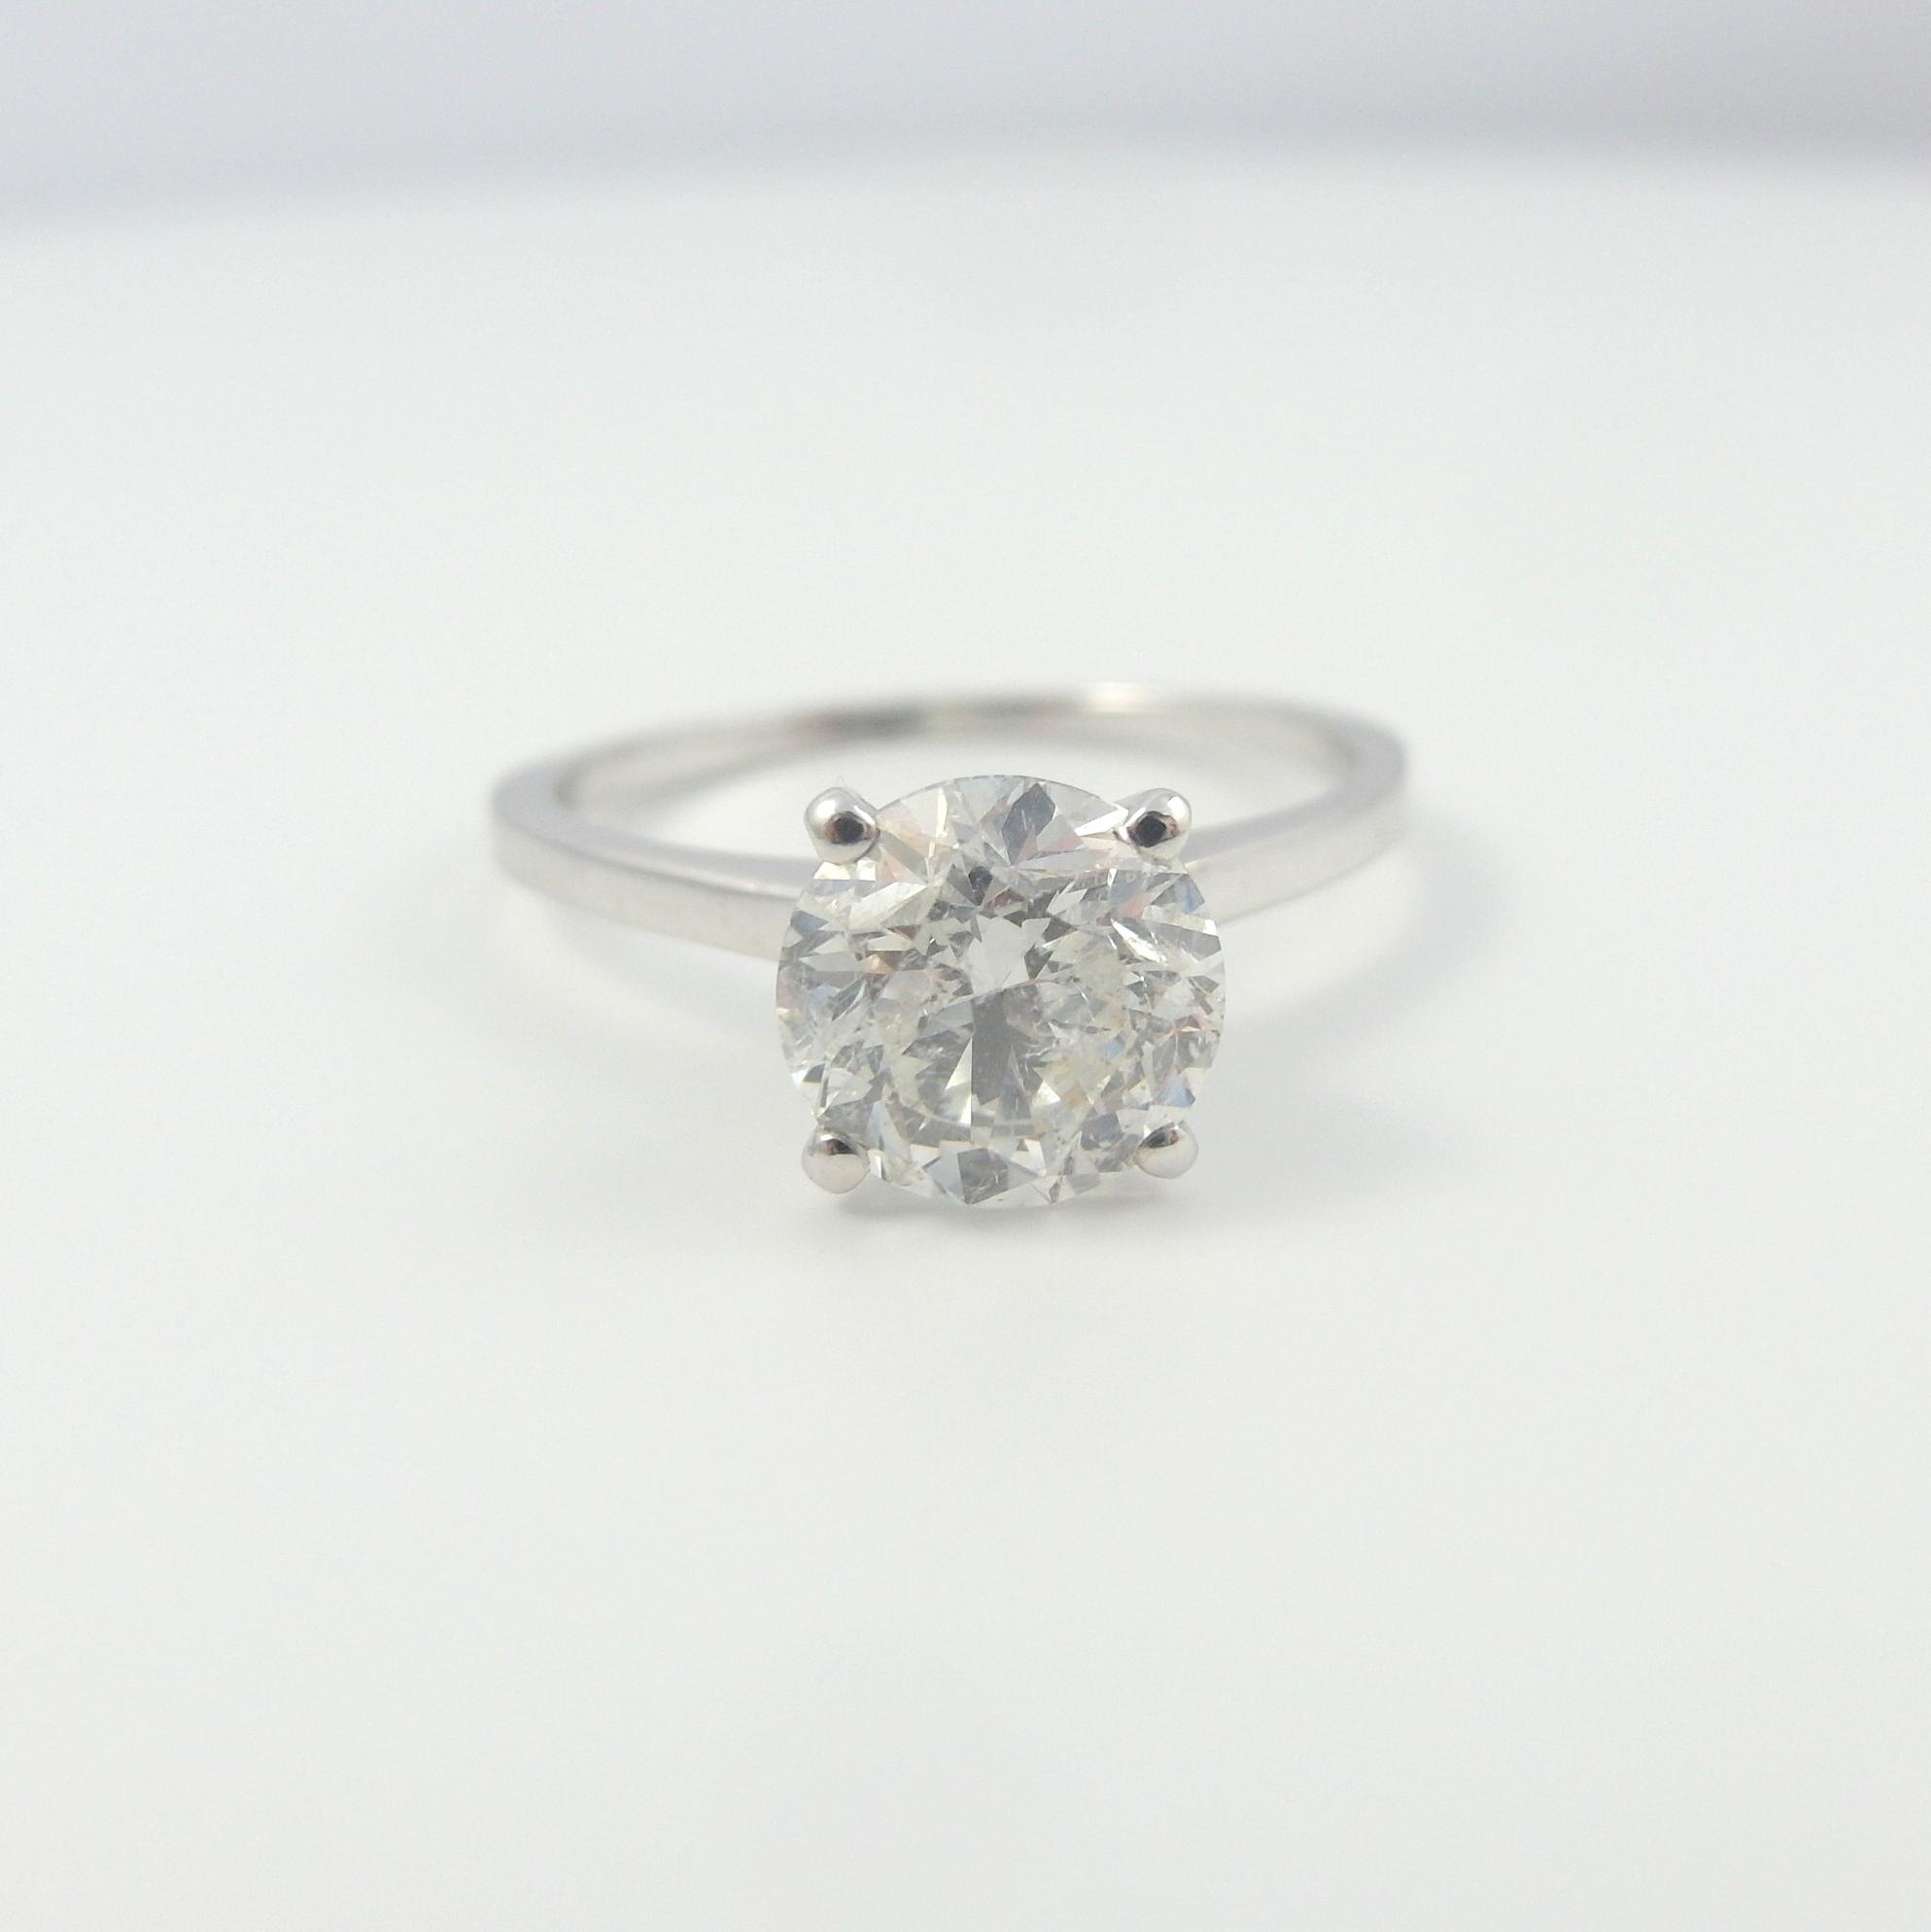 DIAMOND ROUND BRILLIANT RING 4 CARAT REAL VVS EXCLUSIVE BRIDAL 18